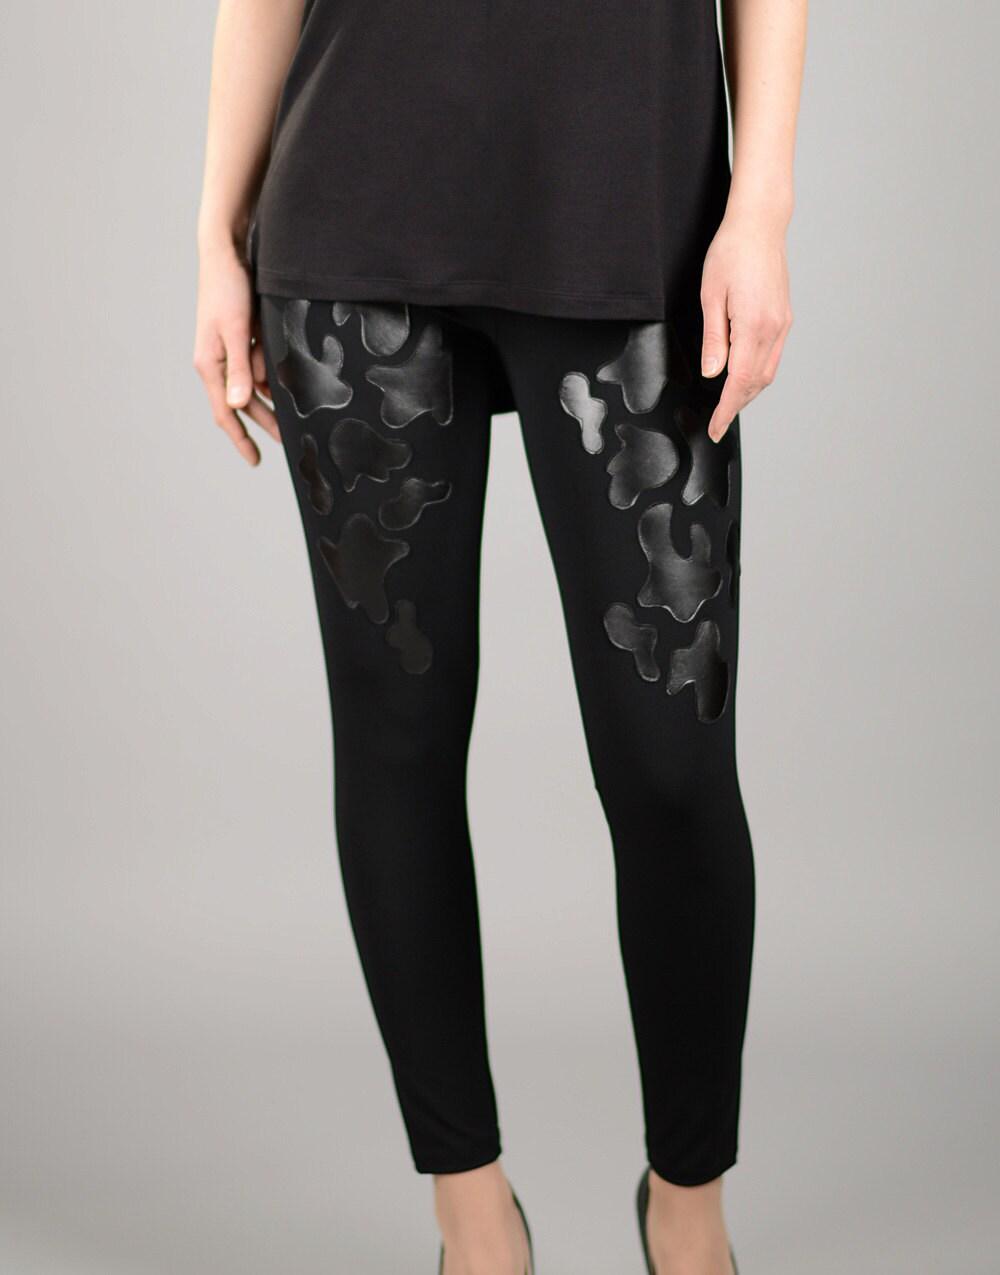 Wonderful Black Flared Yoga Pants Flare Yoga Pants Women39s